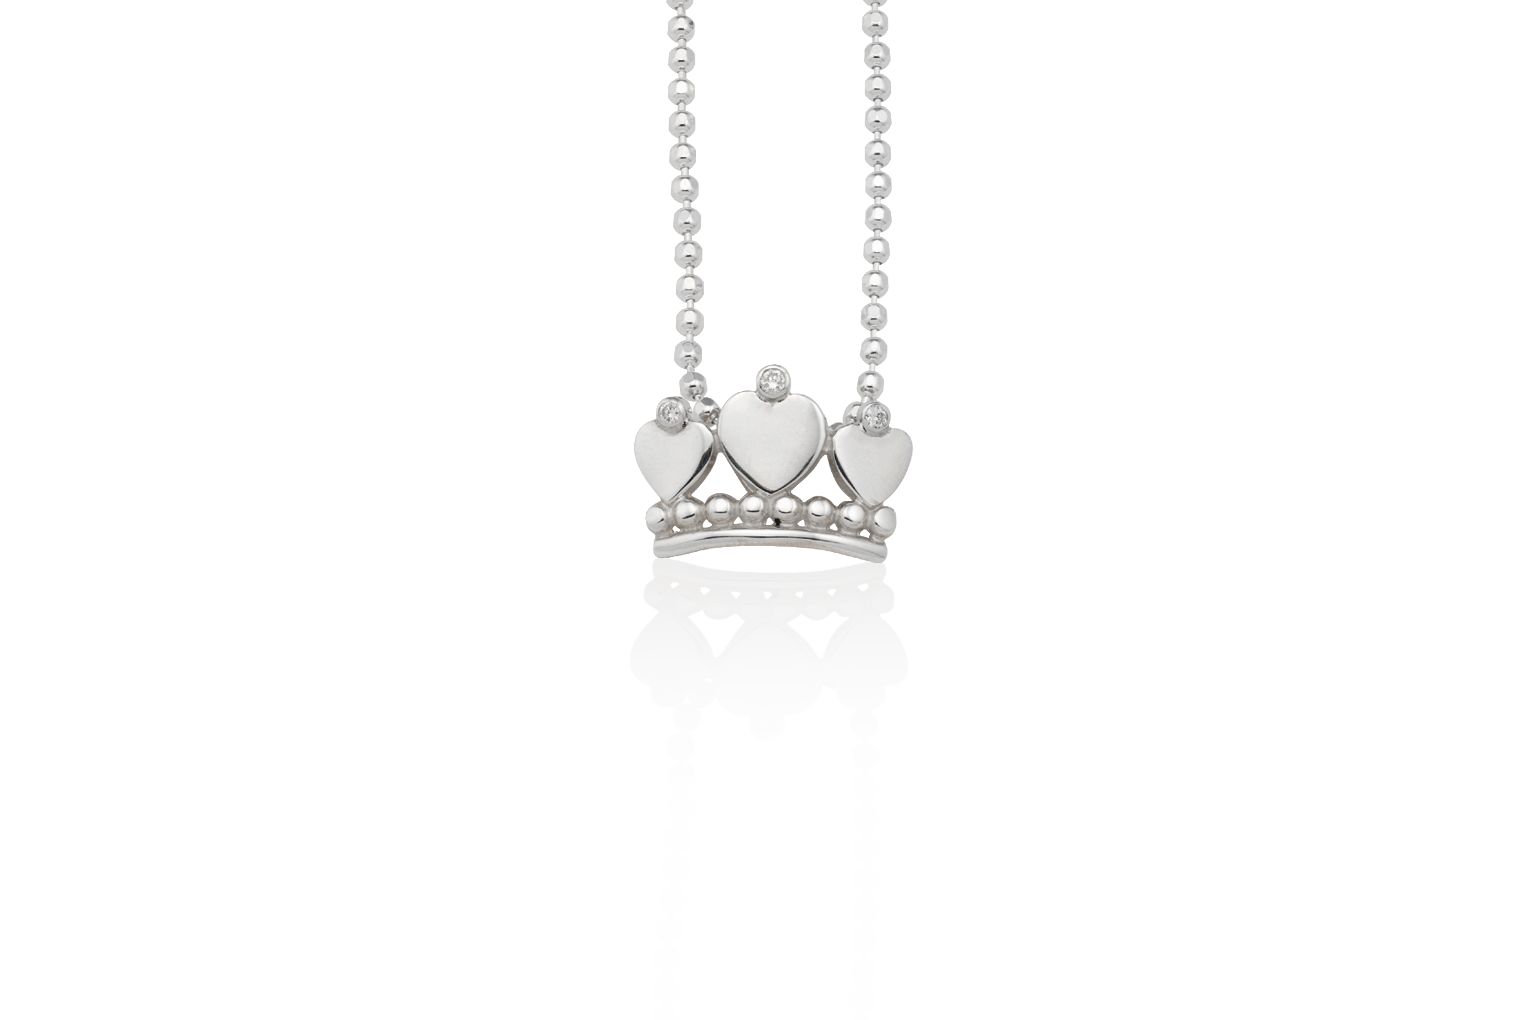 Crown of hearts diamond pendant mignon faget new orleans jewelry crown of hearts diamond pendant aloadofball Choice Image